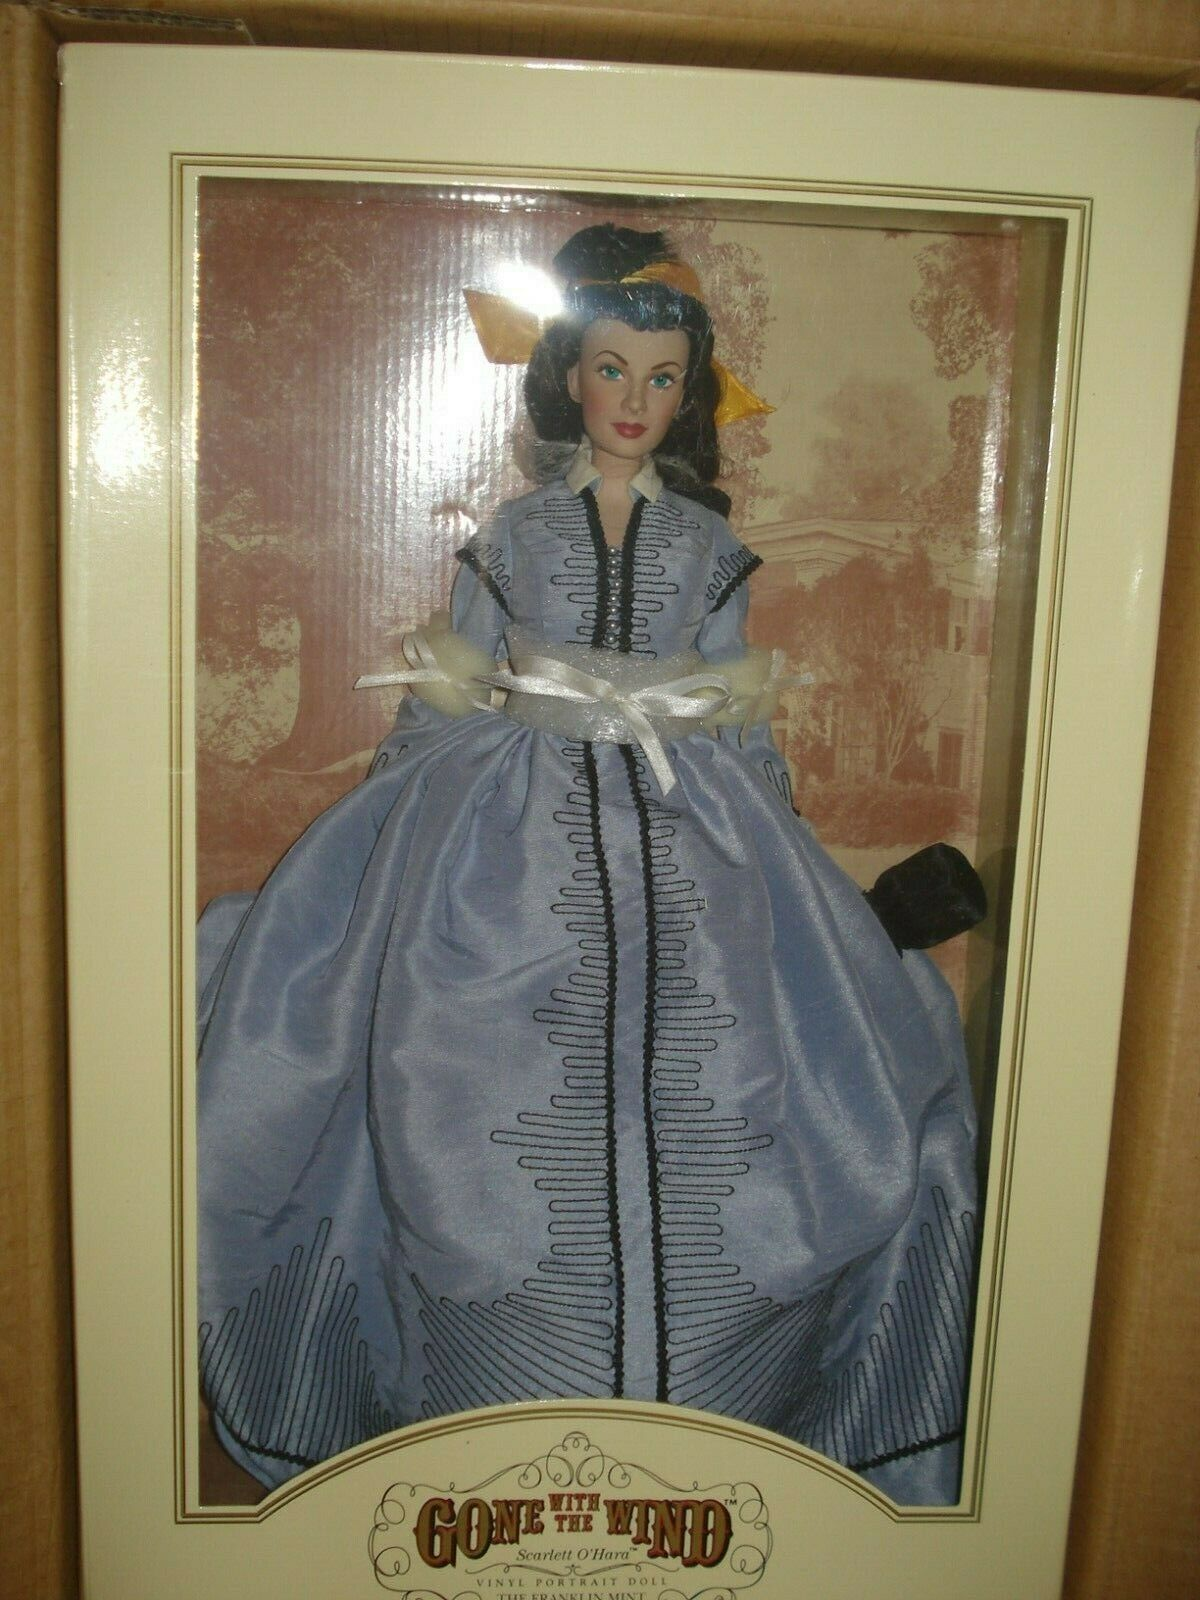 Franklin Mint Scarlett O'Hara portrait vinyl doll Shanty Town